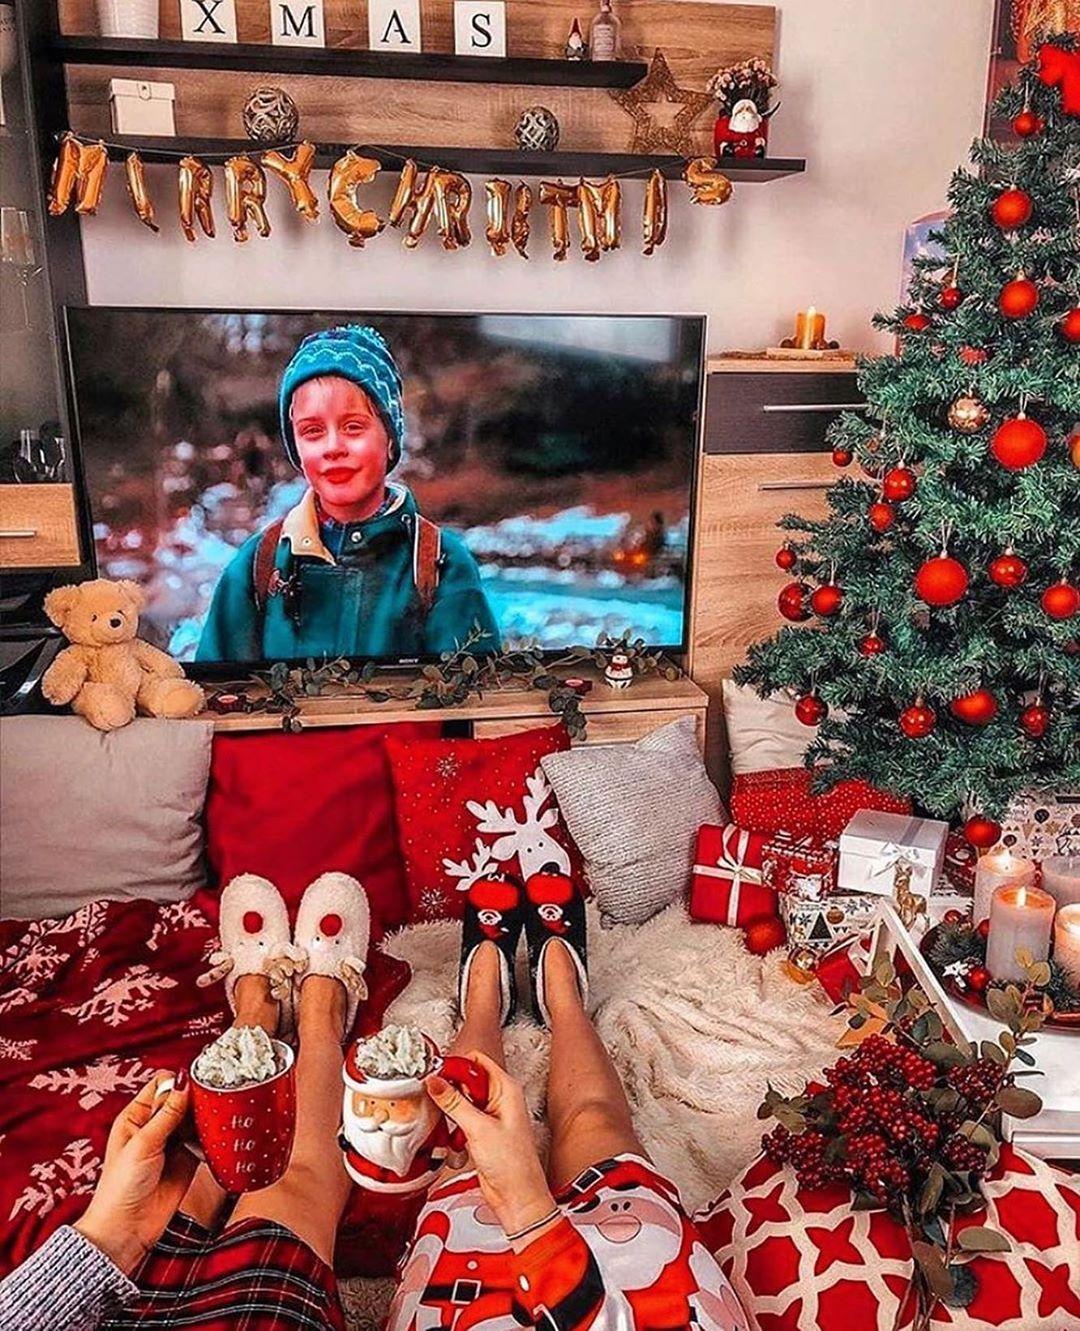 Santa Claus On Instagram 143 Days Left Until Christmas Follow Santaclaus Wintermood Wintert In 2020 Christmas Christmas Scenes Christmas Snow